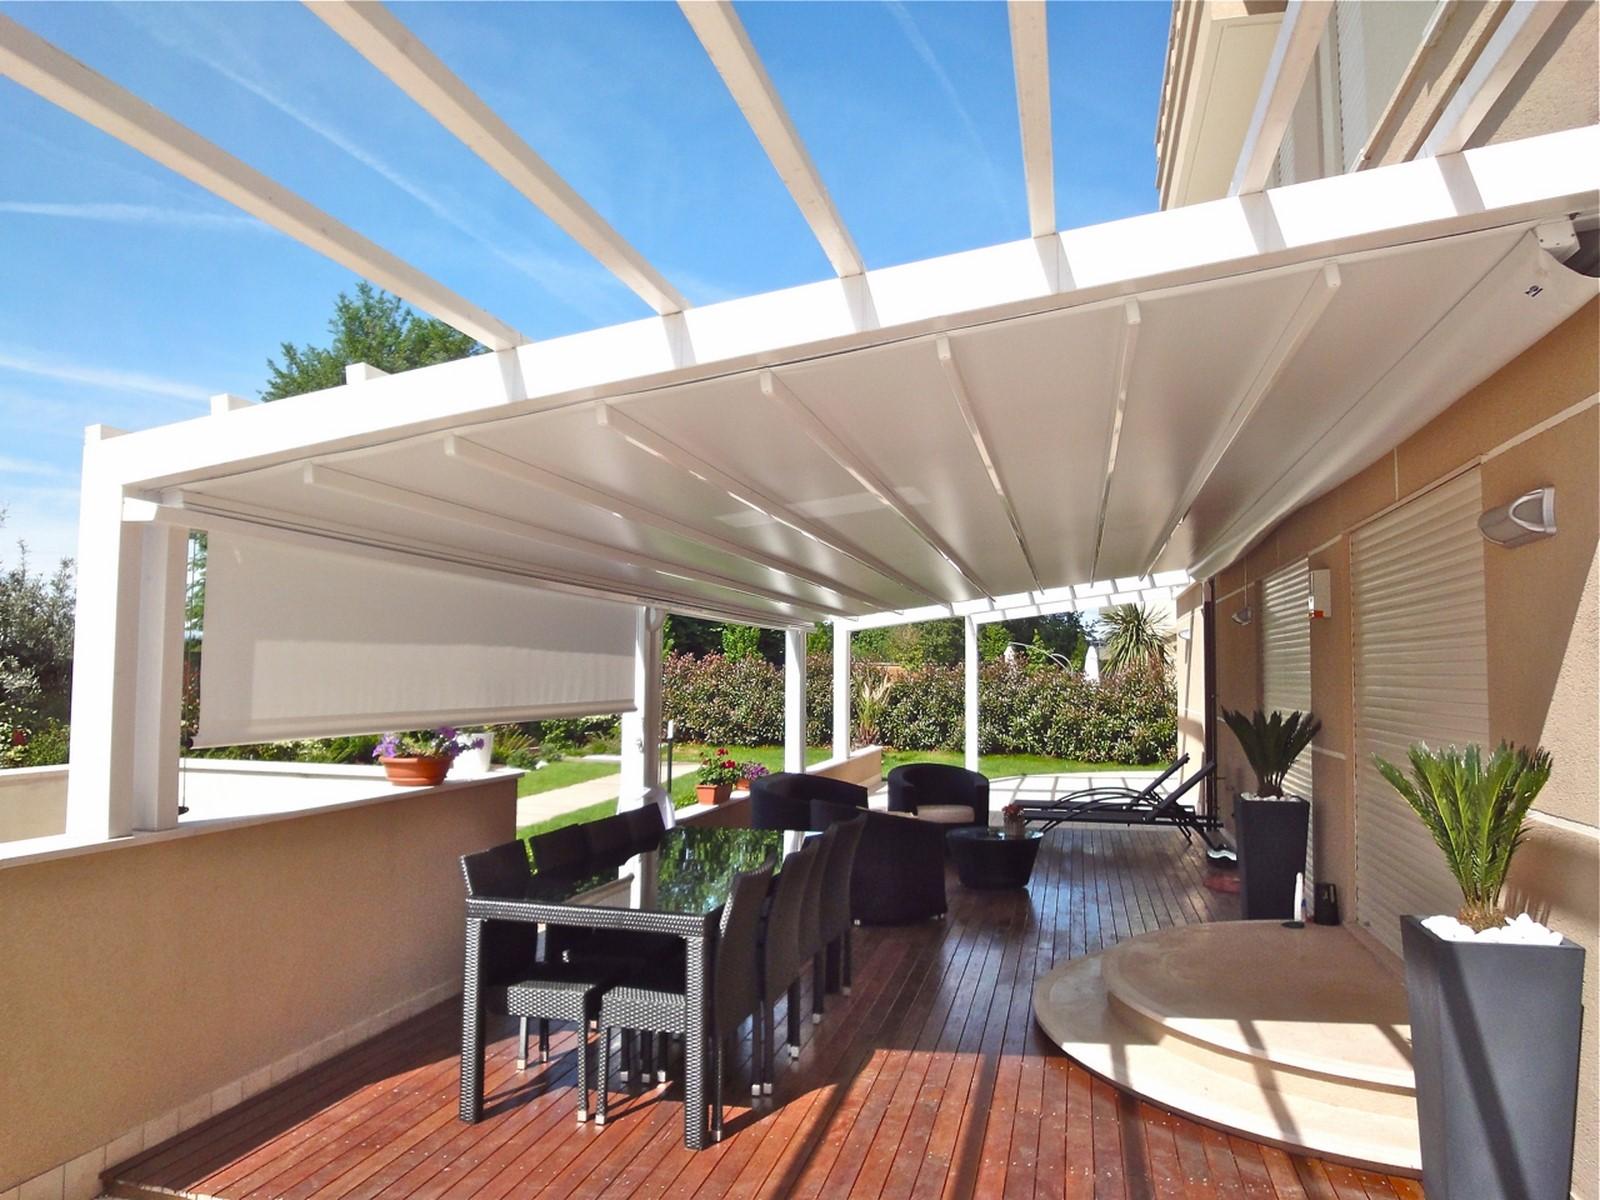 Stunning Tende Da Sole Per Terrazze Gallery - Design and Ideas ...